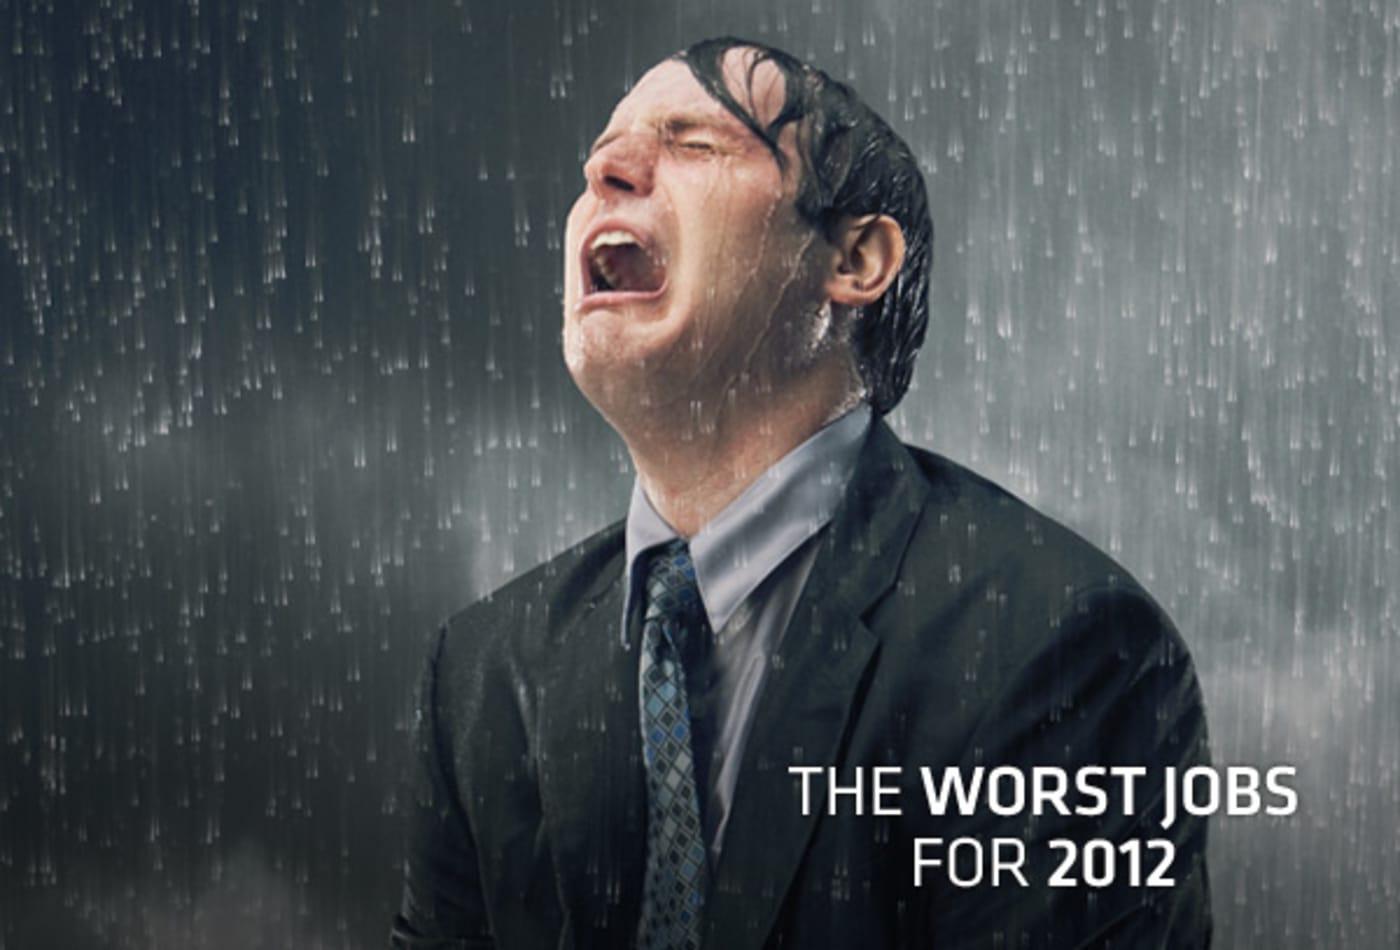 worst-jobs-2012-cover2.jpg